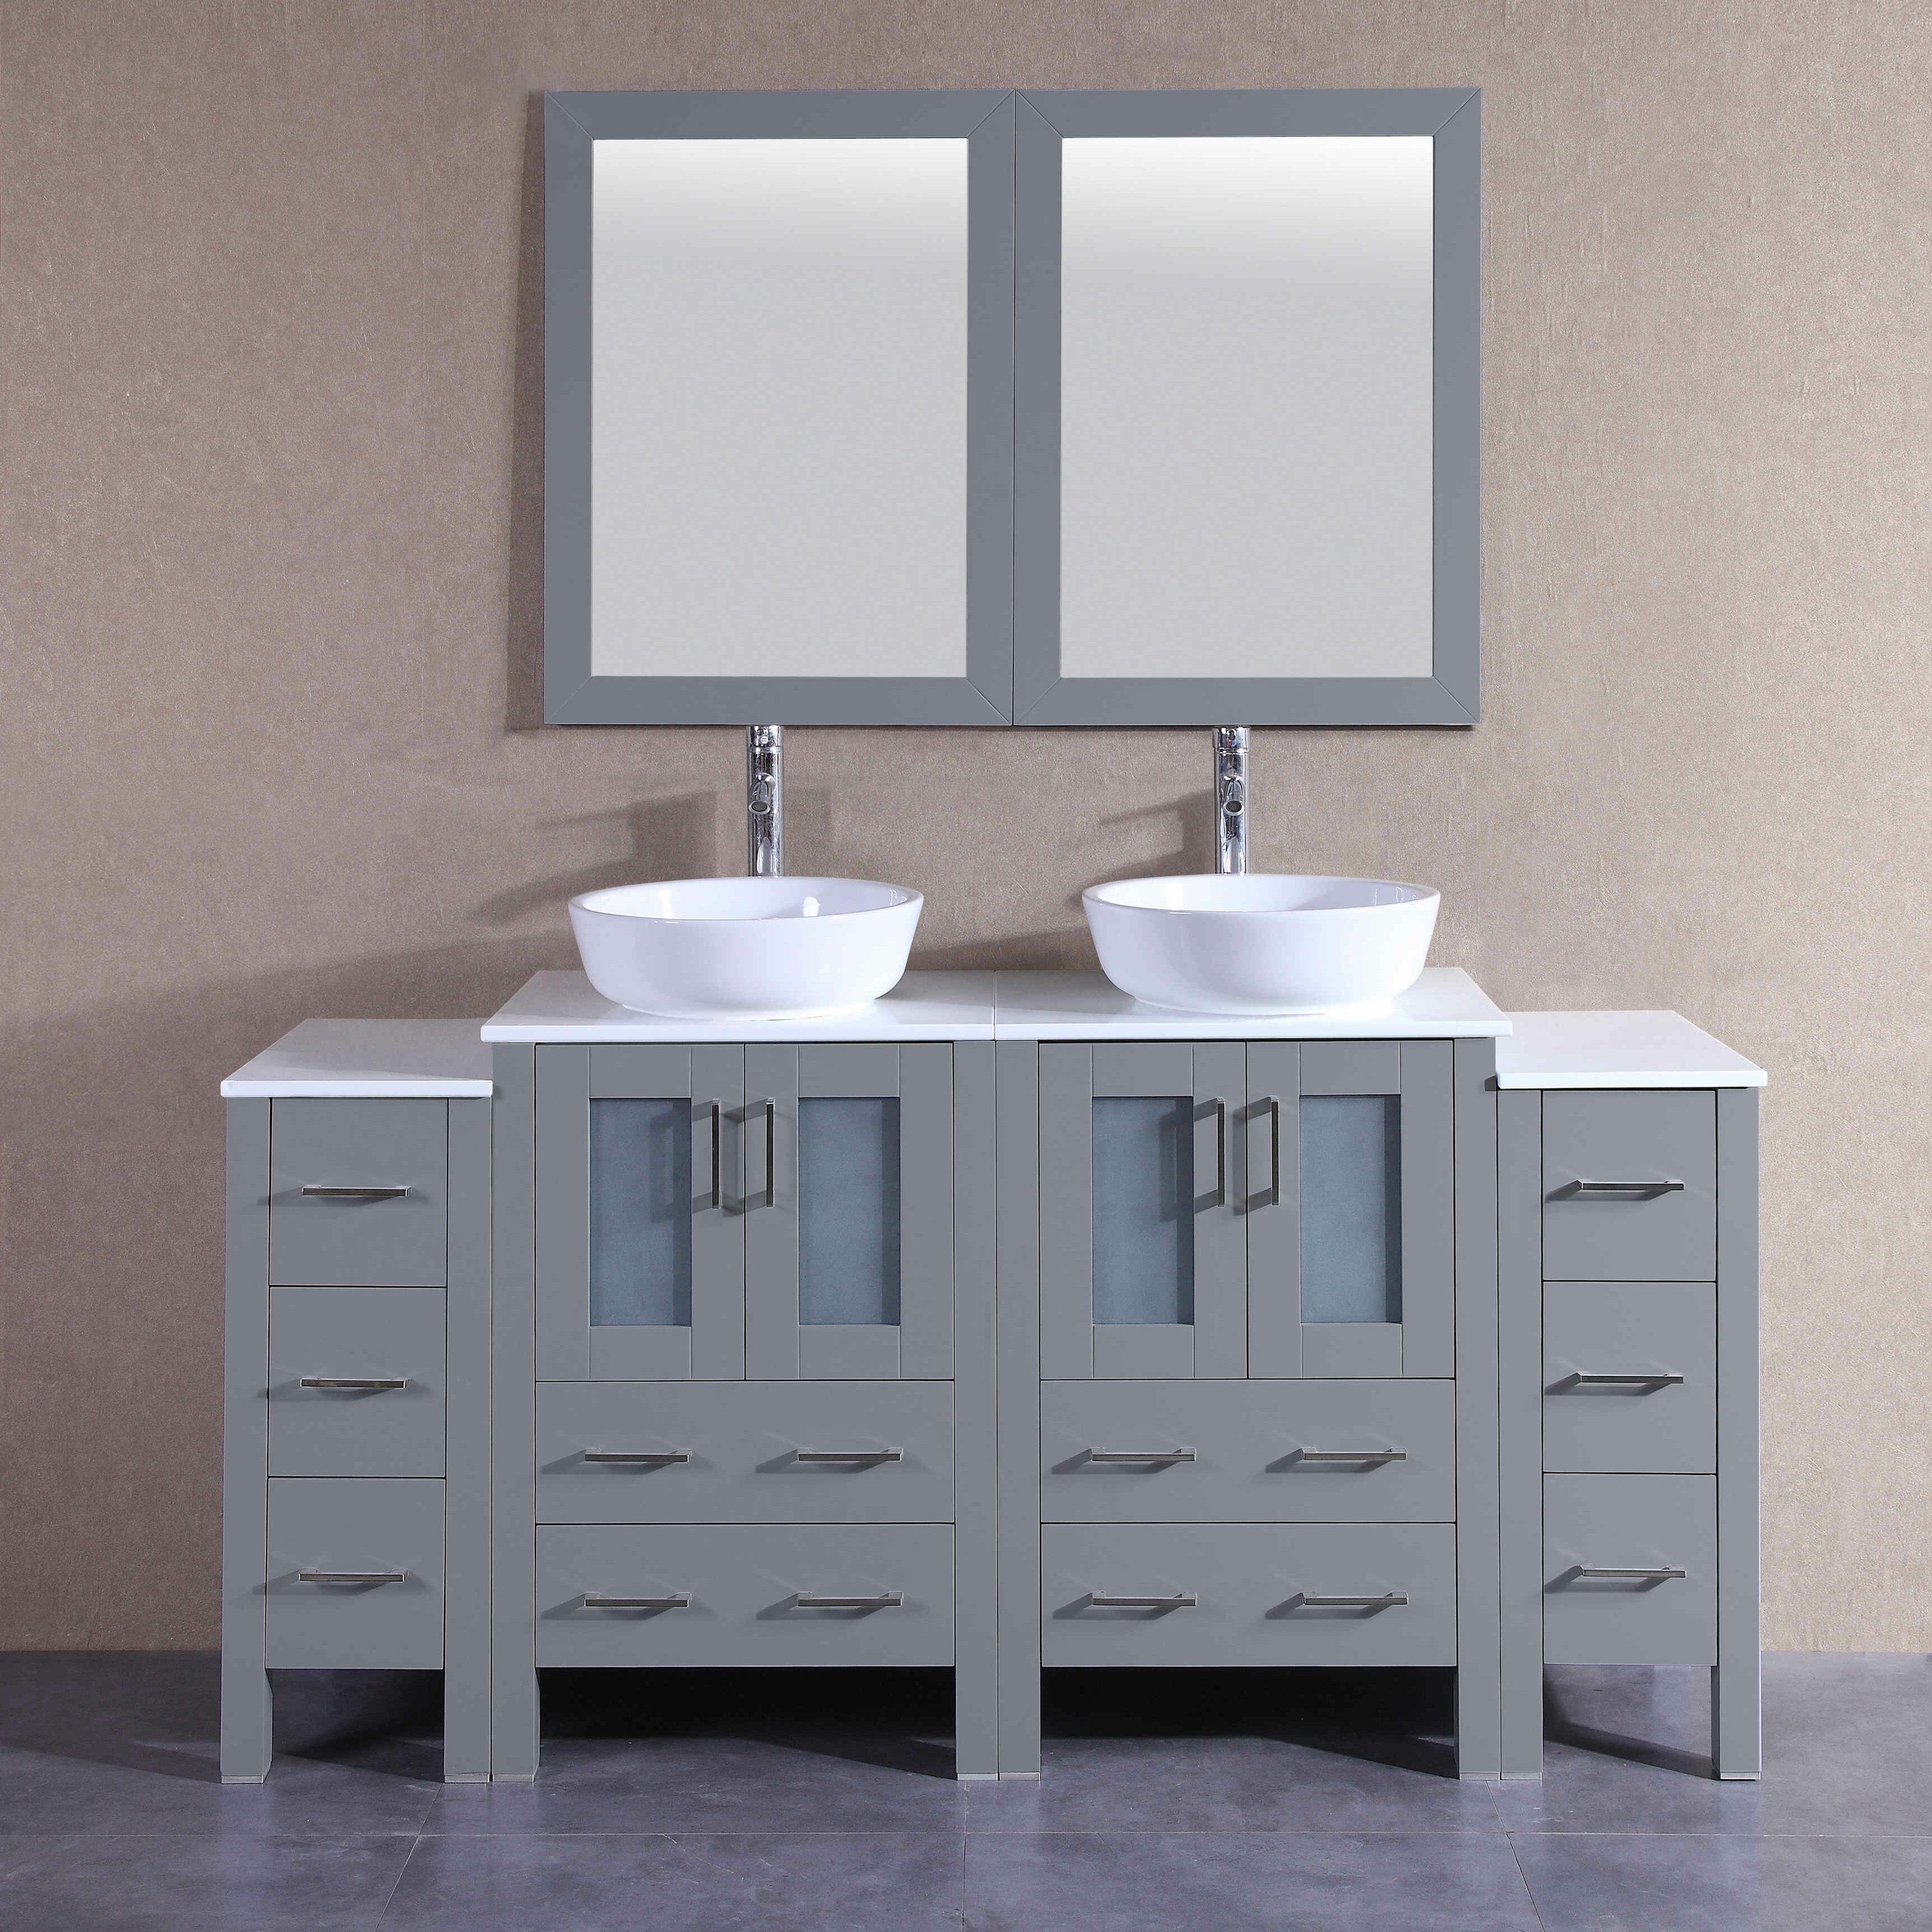 "Kilmarnock 27"" Double Bathroom Vanity Set with Mirror"